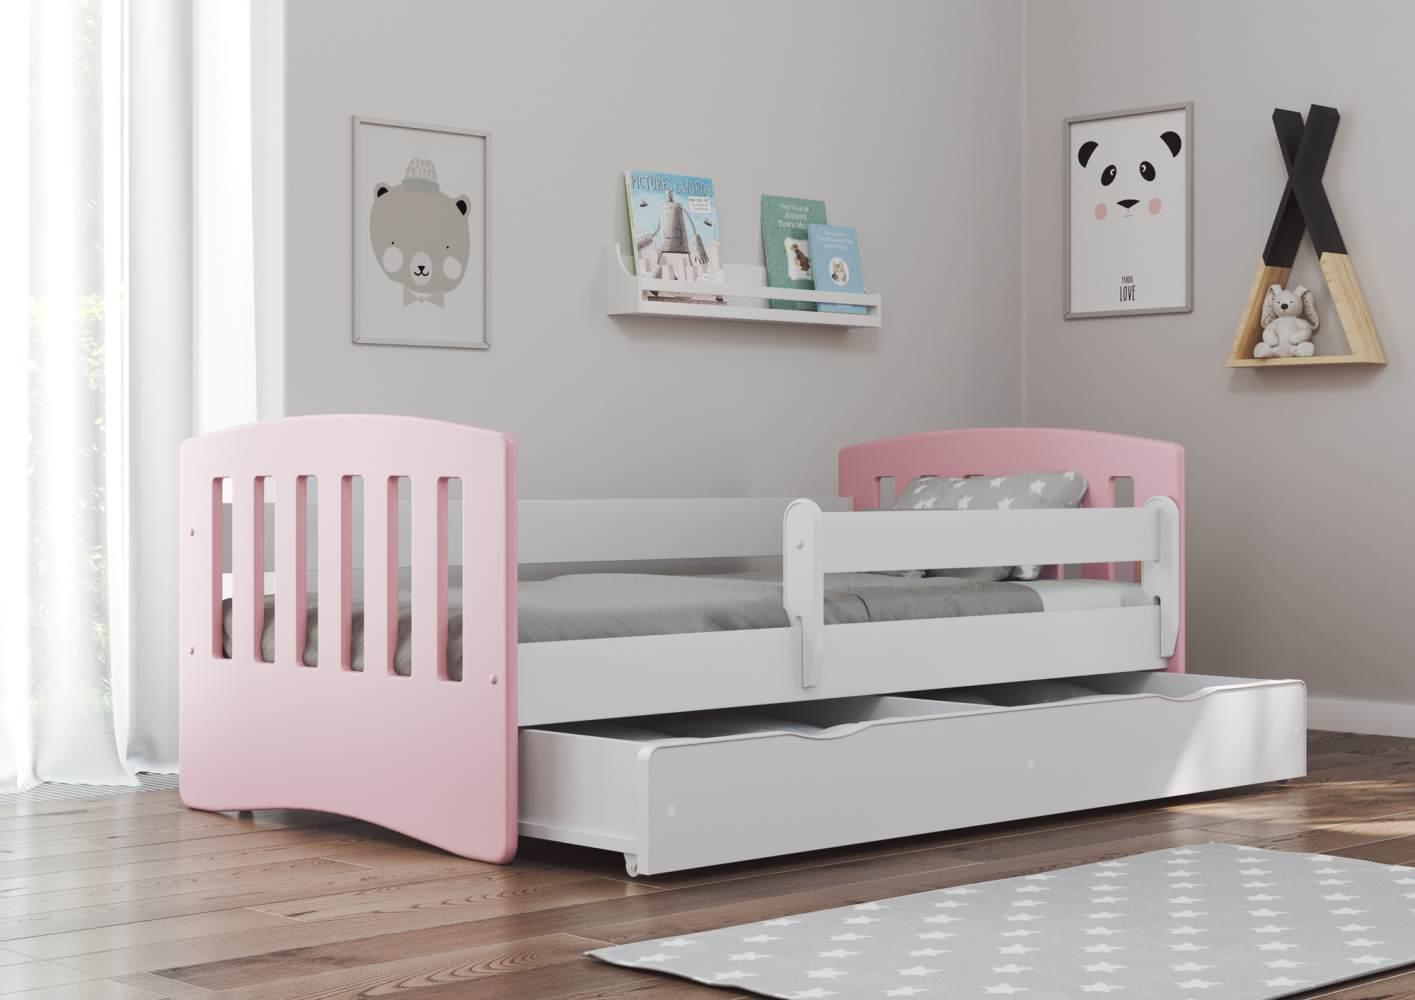 Bjird 'Classic' Kinderbett 80 x 180 cm, Puderrosa, inkl. Rausfallschutz, Lattenrost und Bettschublade Bild 1